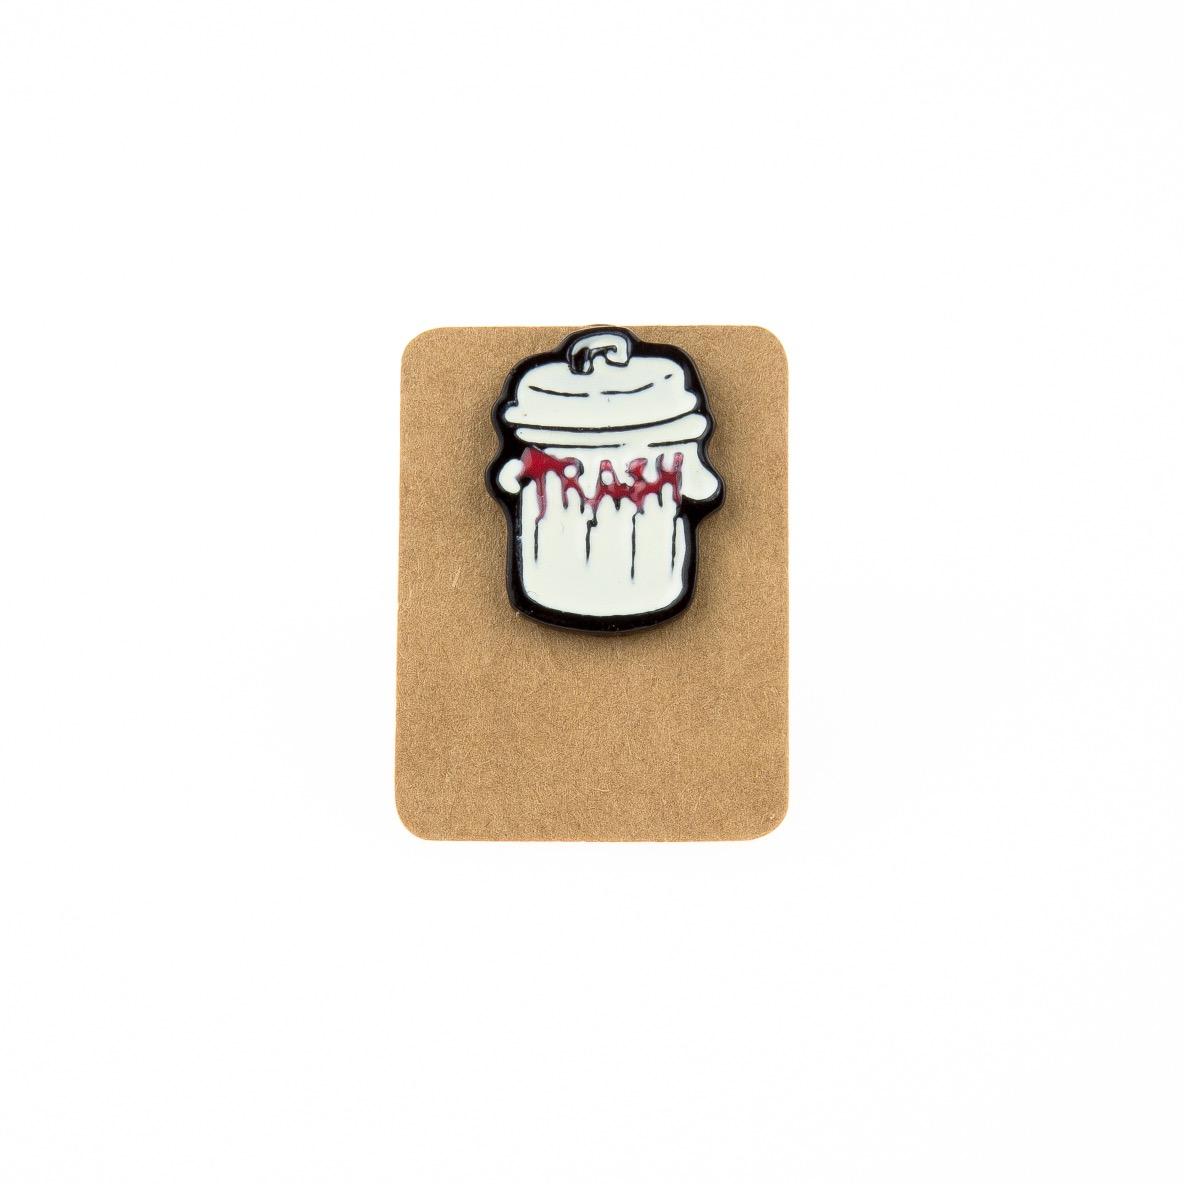 Metal Trash Enamel Pin Badge